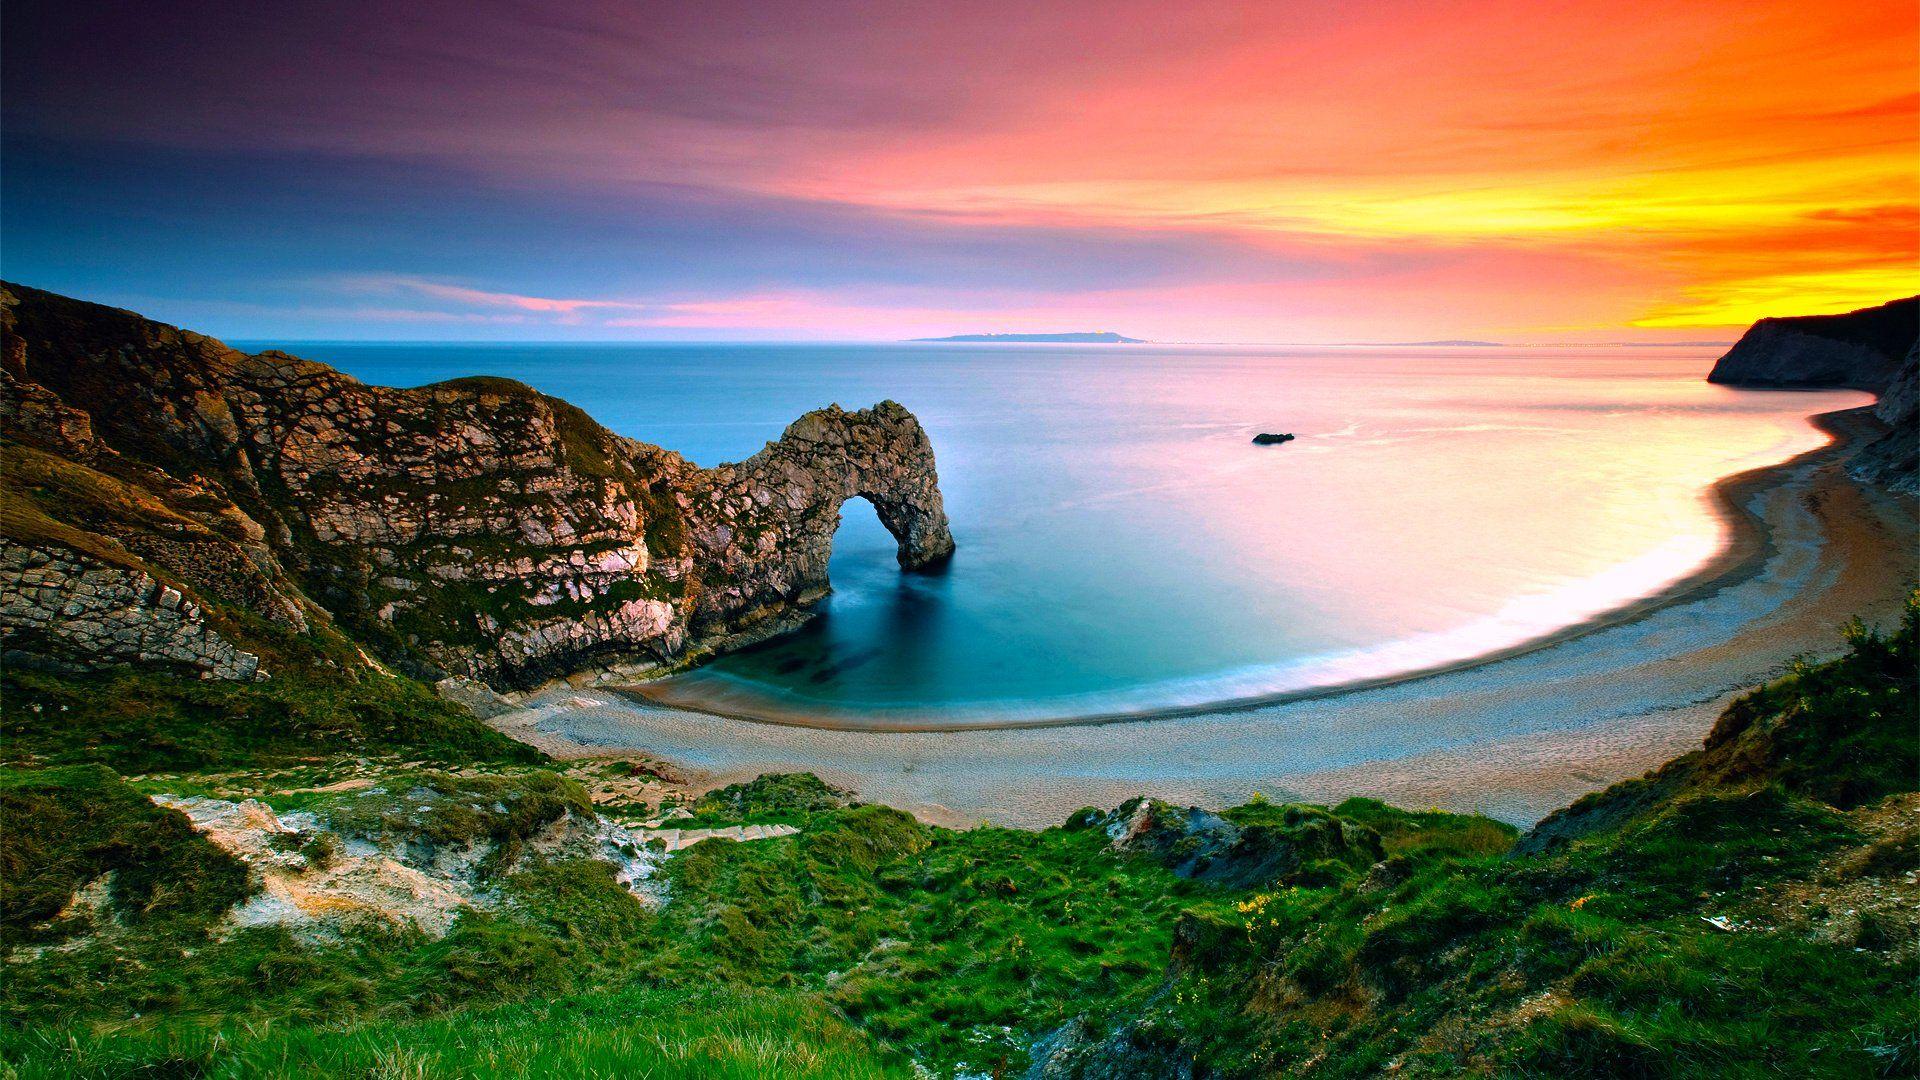 nature landscape sunrise england beach wallpaper hd